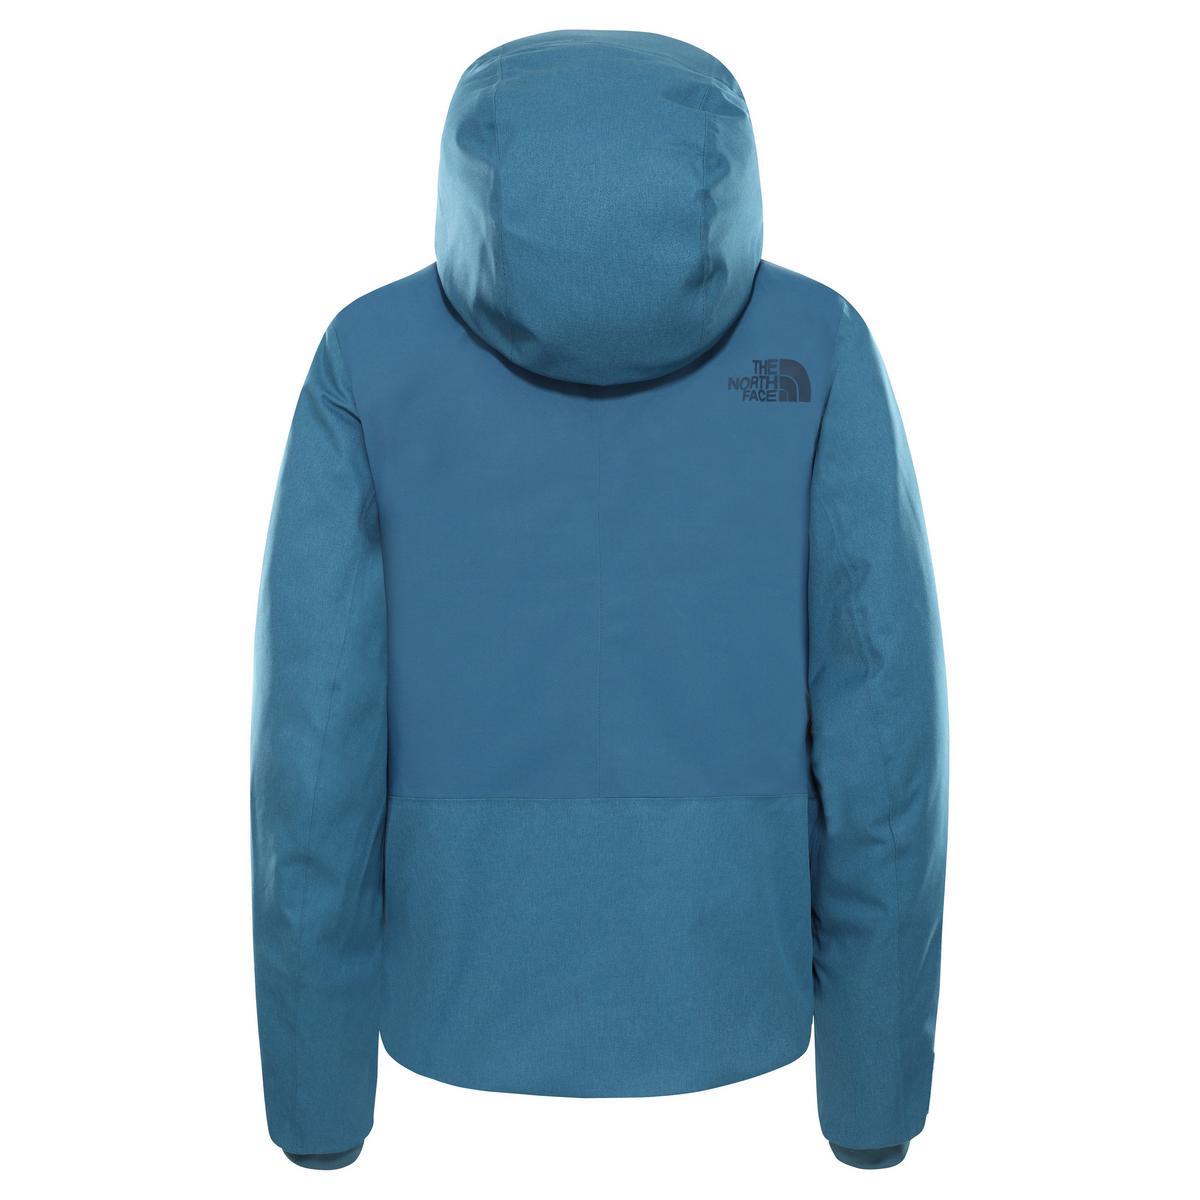 The North Face Women's Lenado Jacket - Mallard Blue